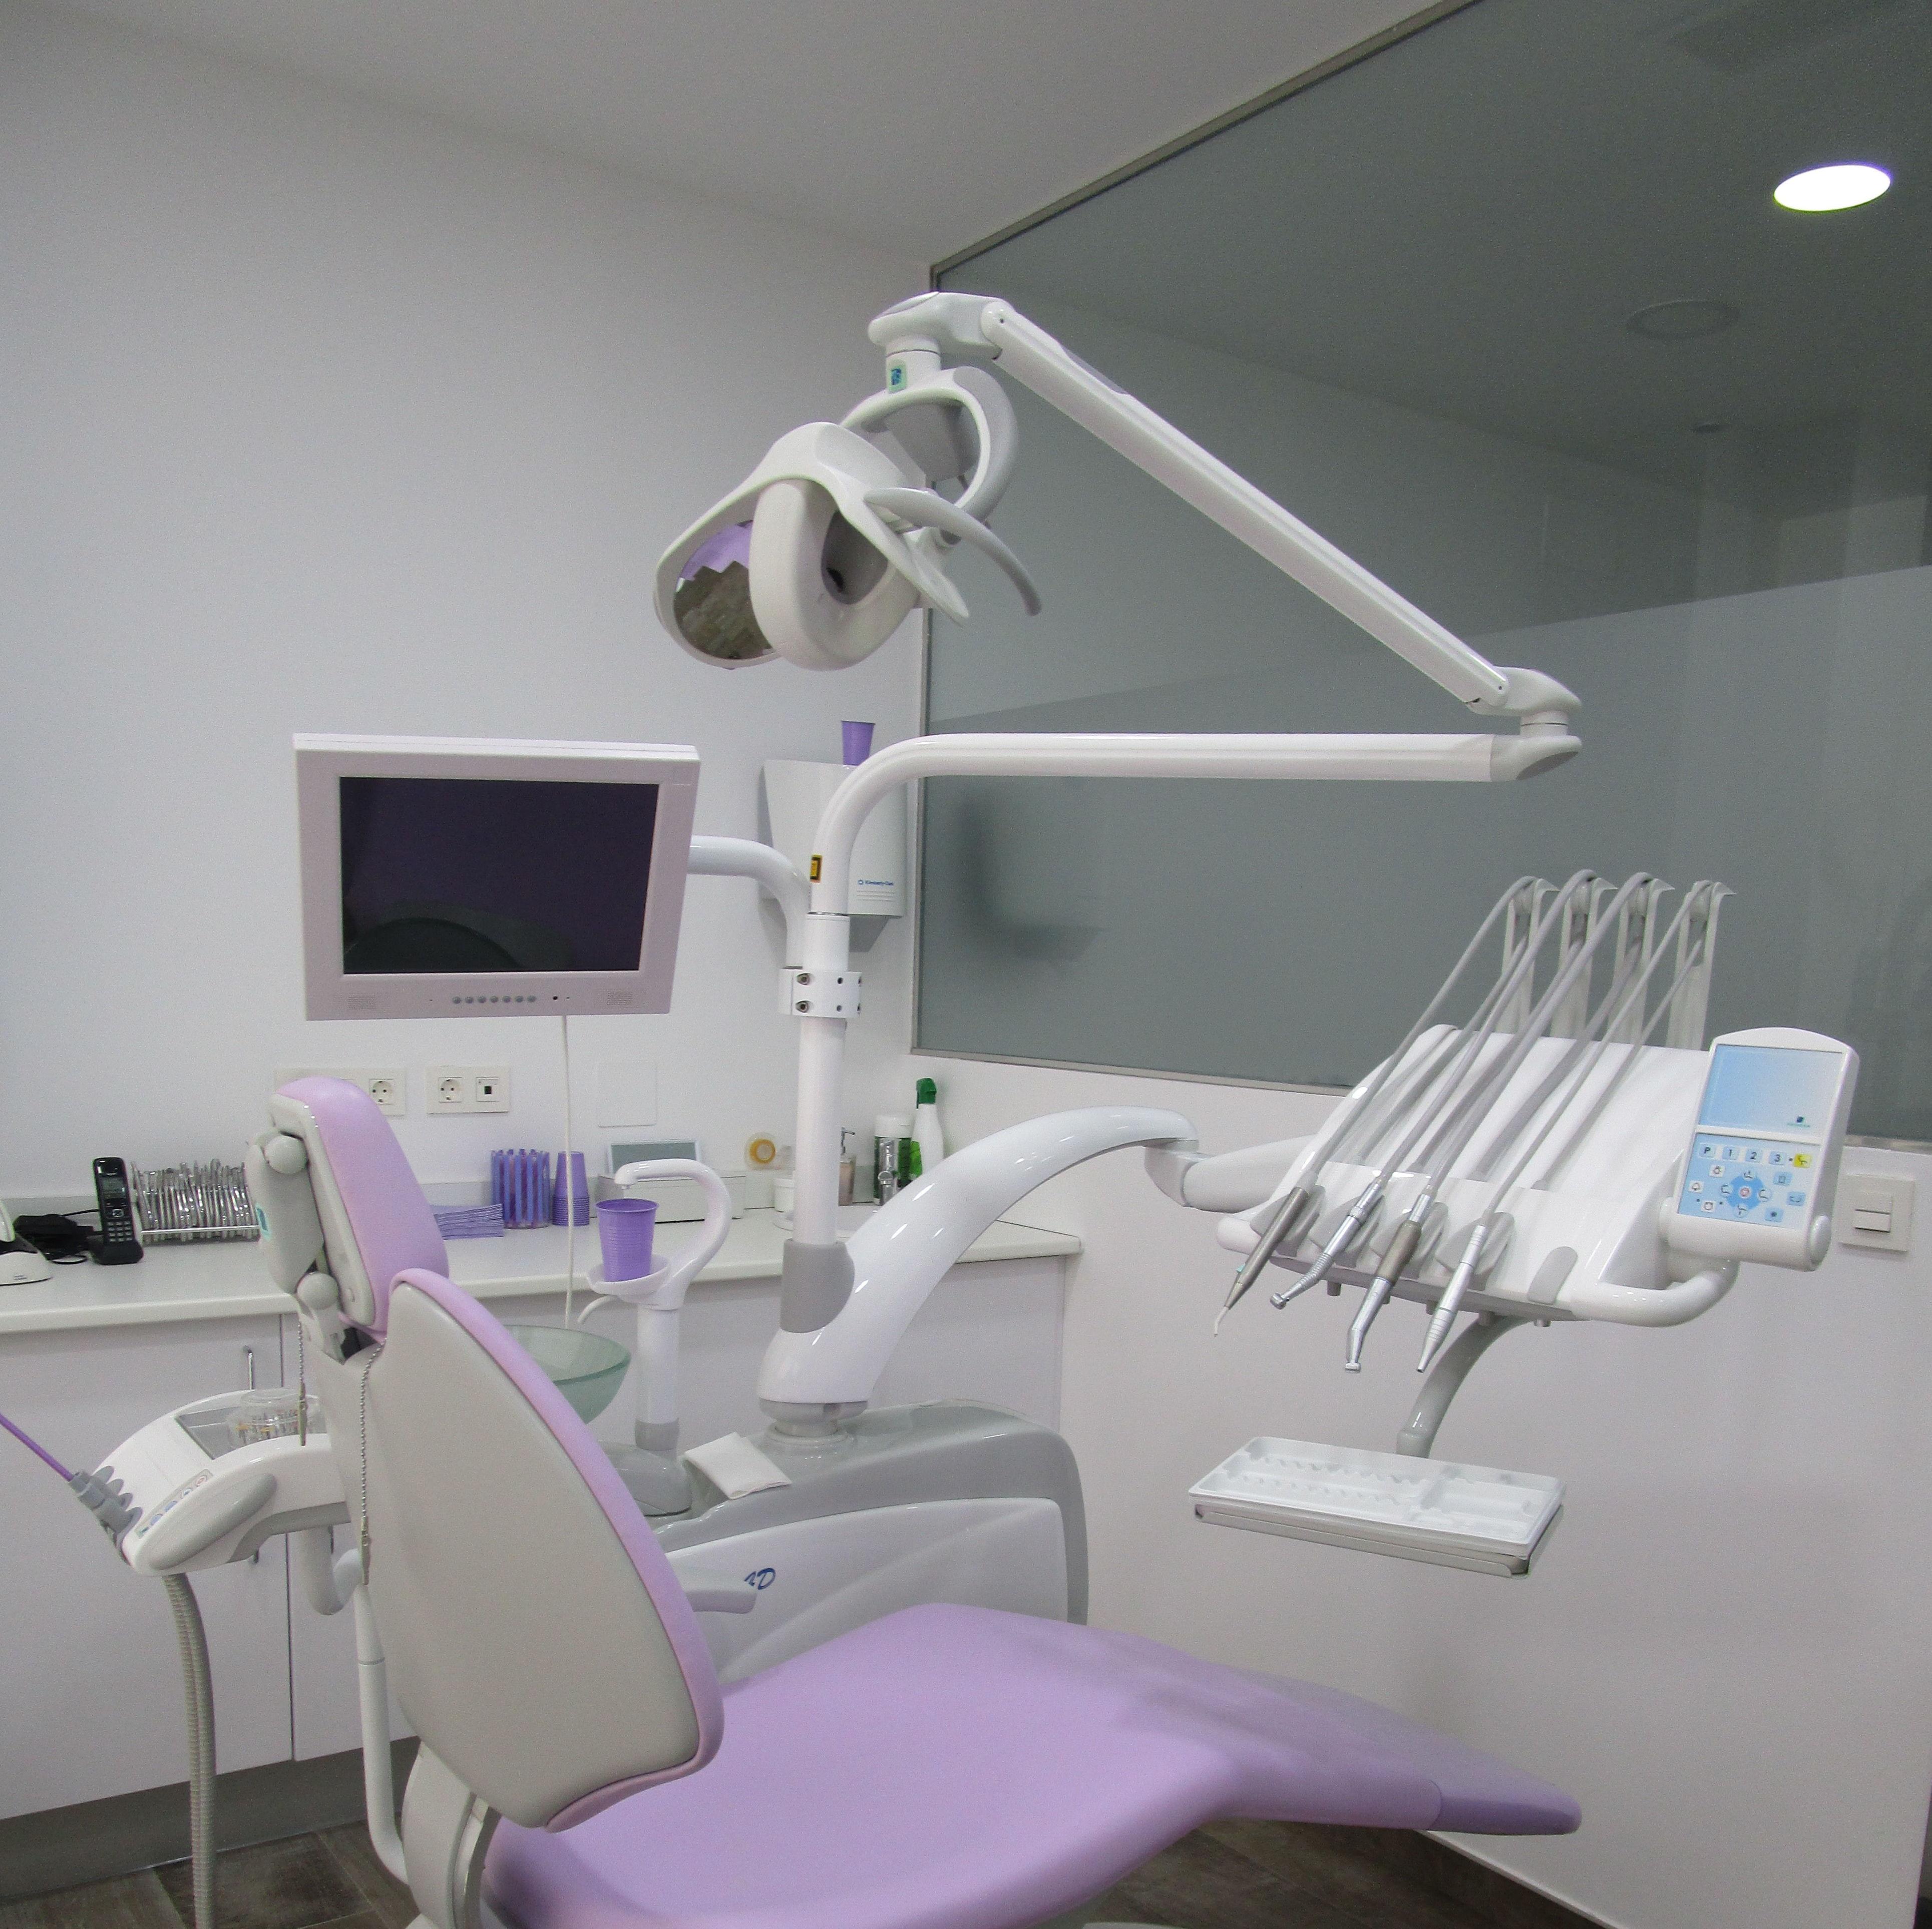 Foto 9 de Dentistas en Badajoz | Maribel Soto Vera - MS Dental